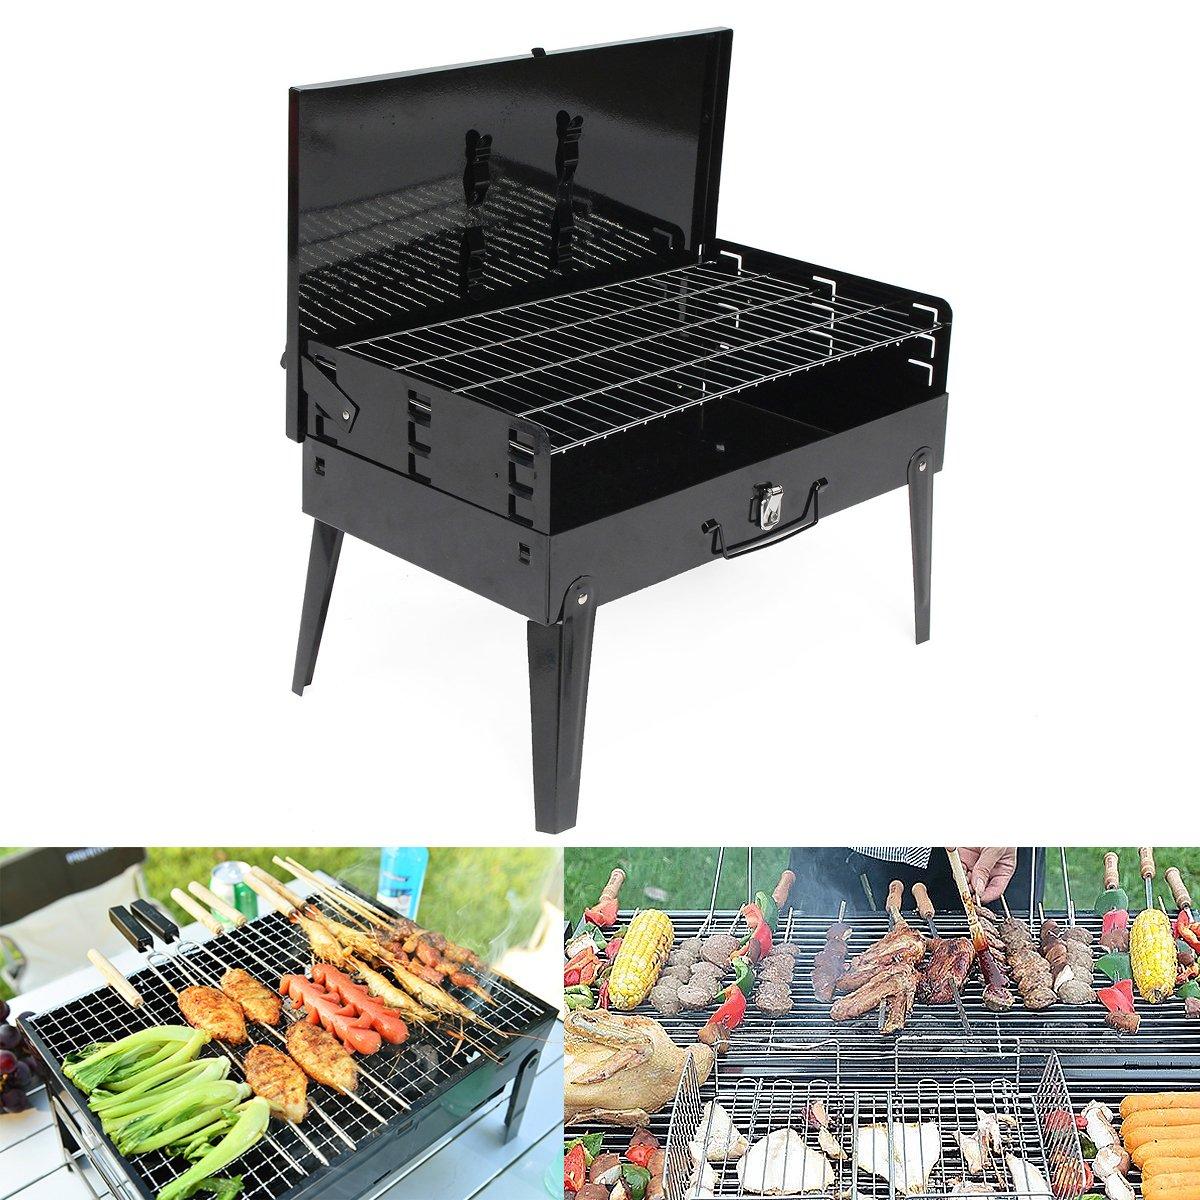 LaDicha 43X 26,5 X21 Cm Outdoor Faltbar Garten Kohlegrill Patio Portable Große Grill